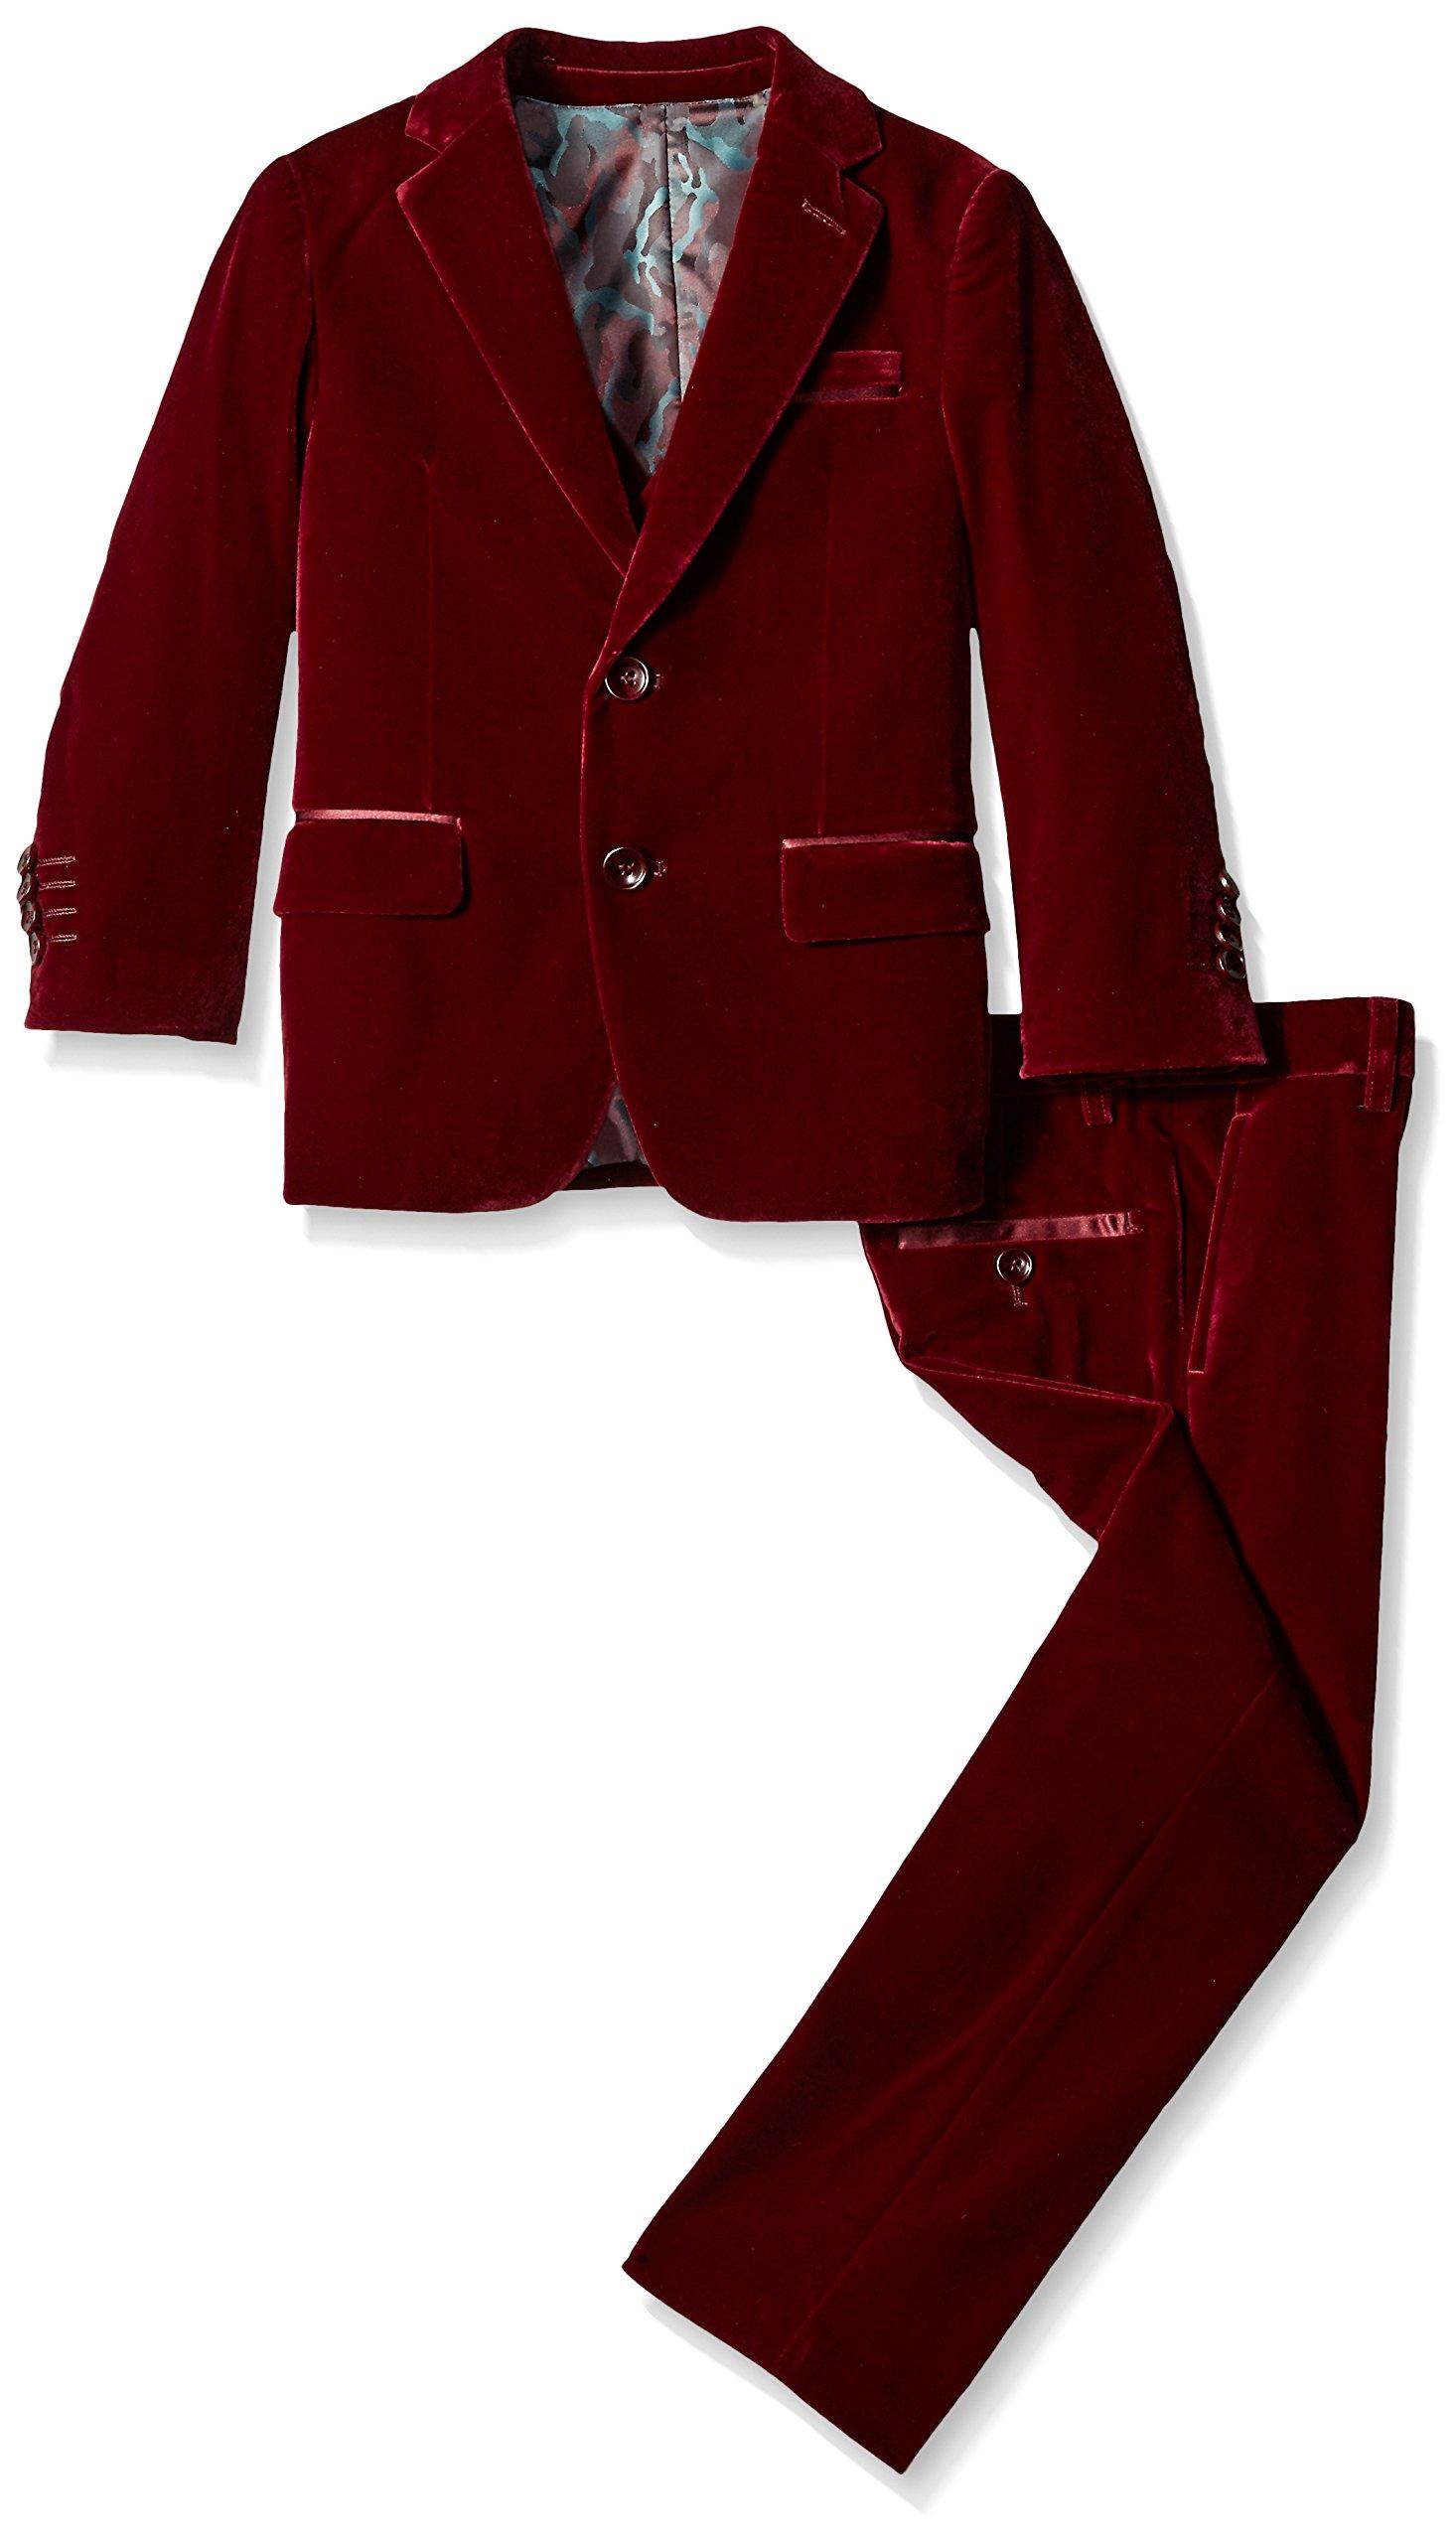 Isaac Mizrahi Boys' Little Boys' 3 Piece Velvet Suit, Burgundy, 6 by Isaac Mizrahi